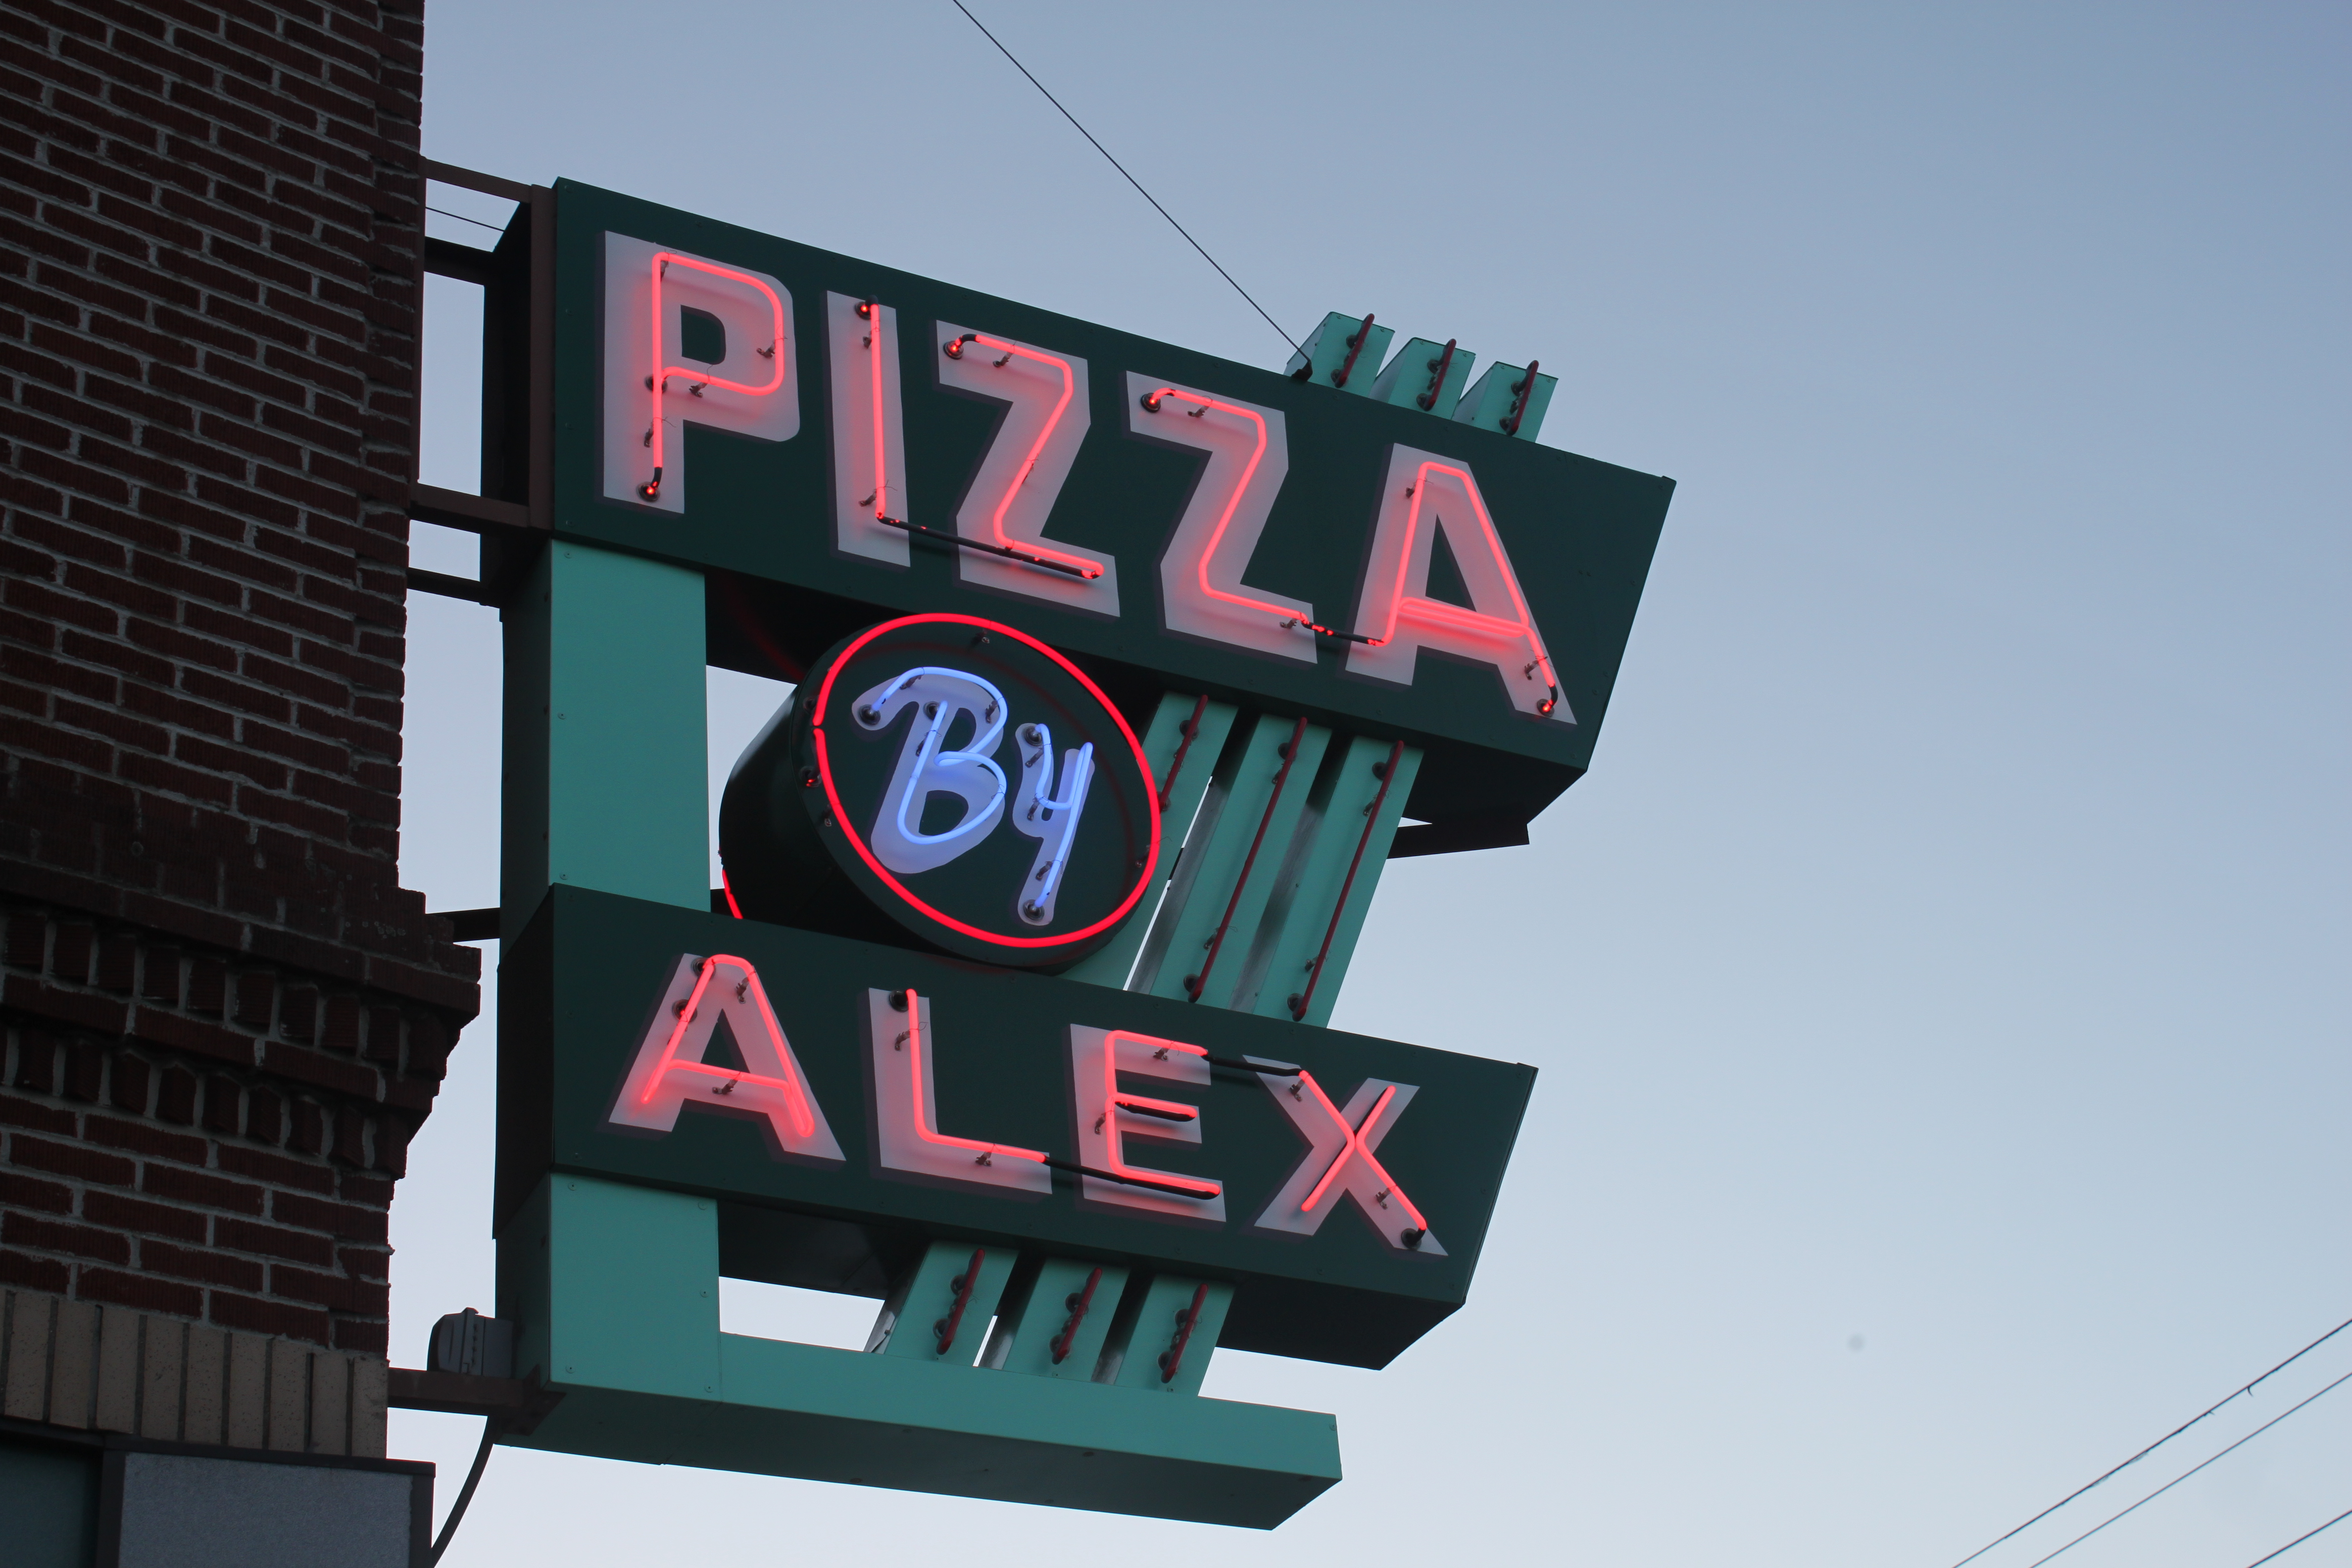 Pizza by Alex - 93 Alfred Street, Biddeford, Maine U.S.A. - November 4, 2015